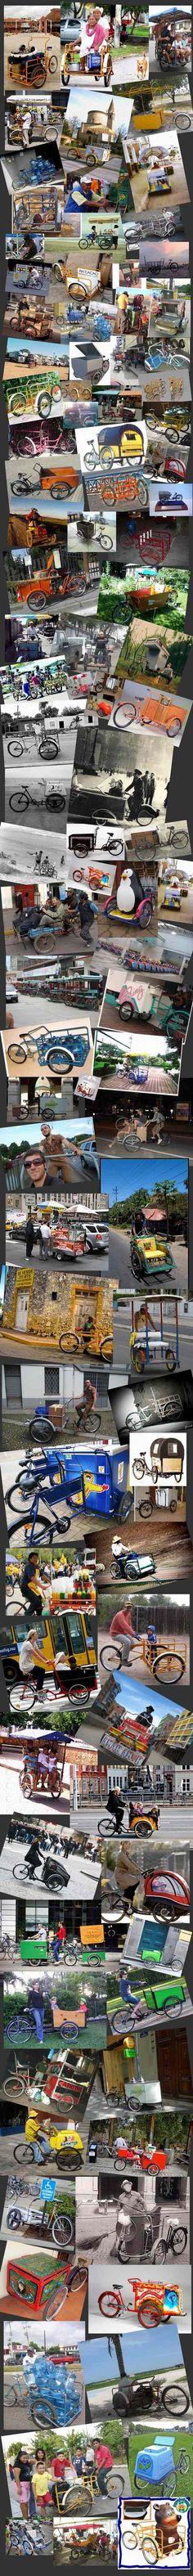 100 ways to use cargobikes